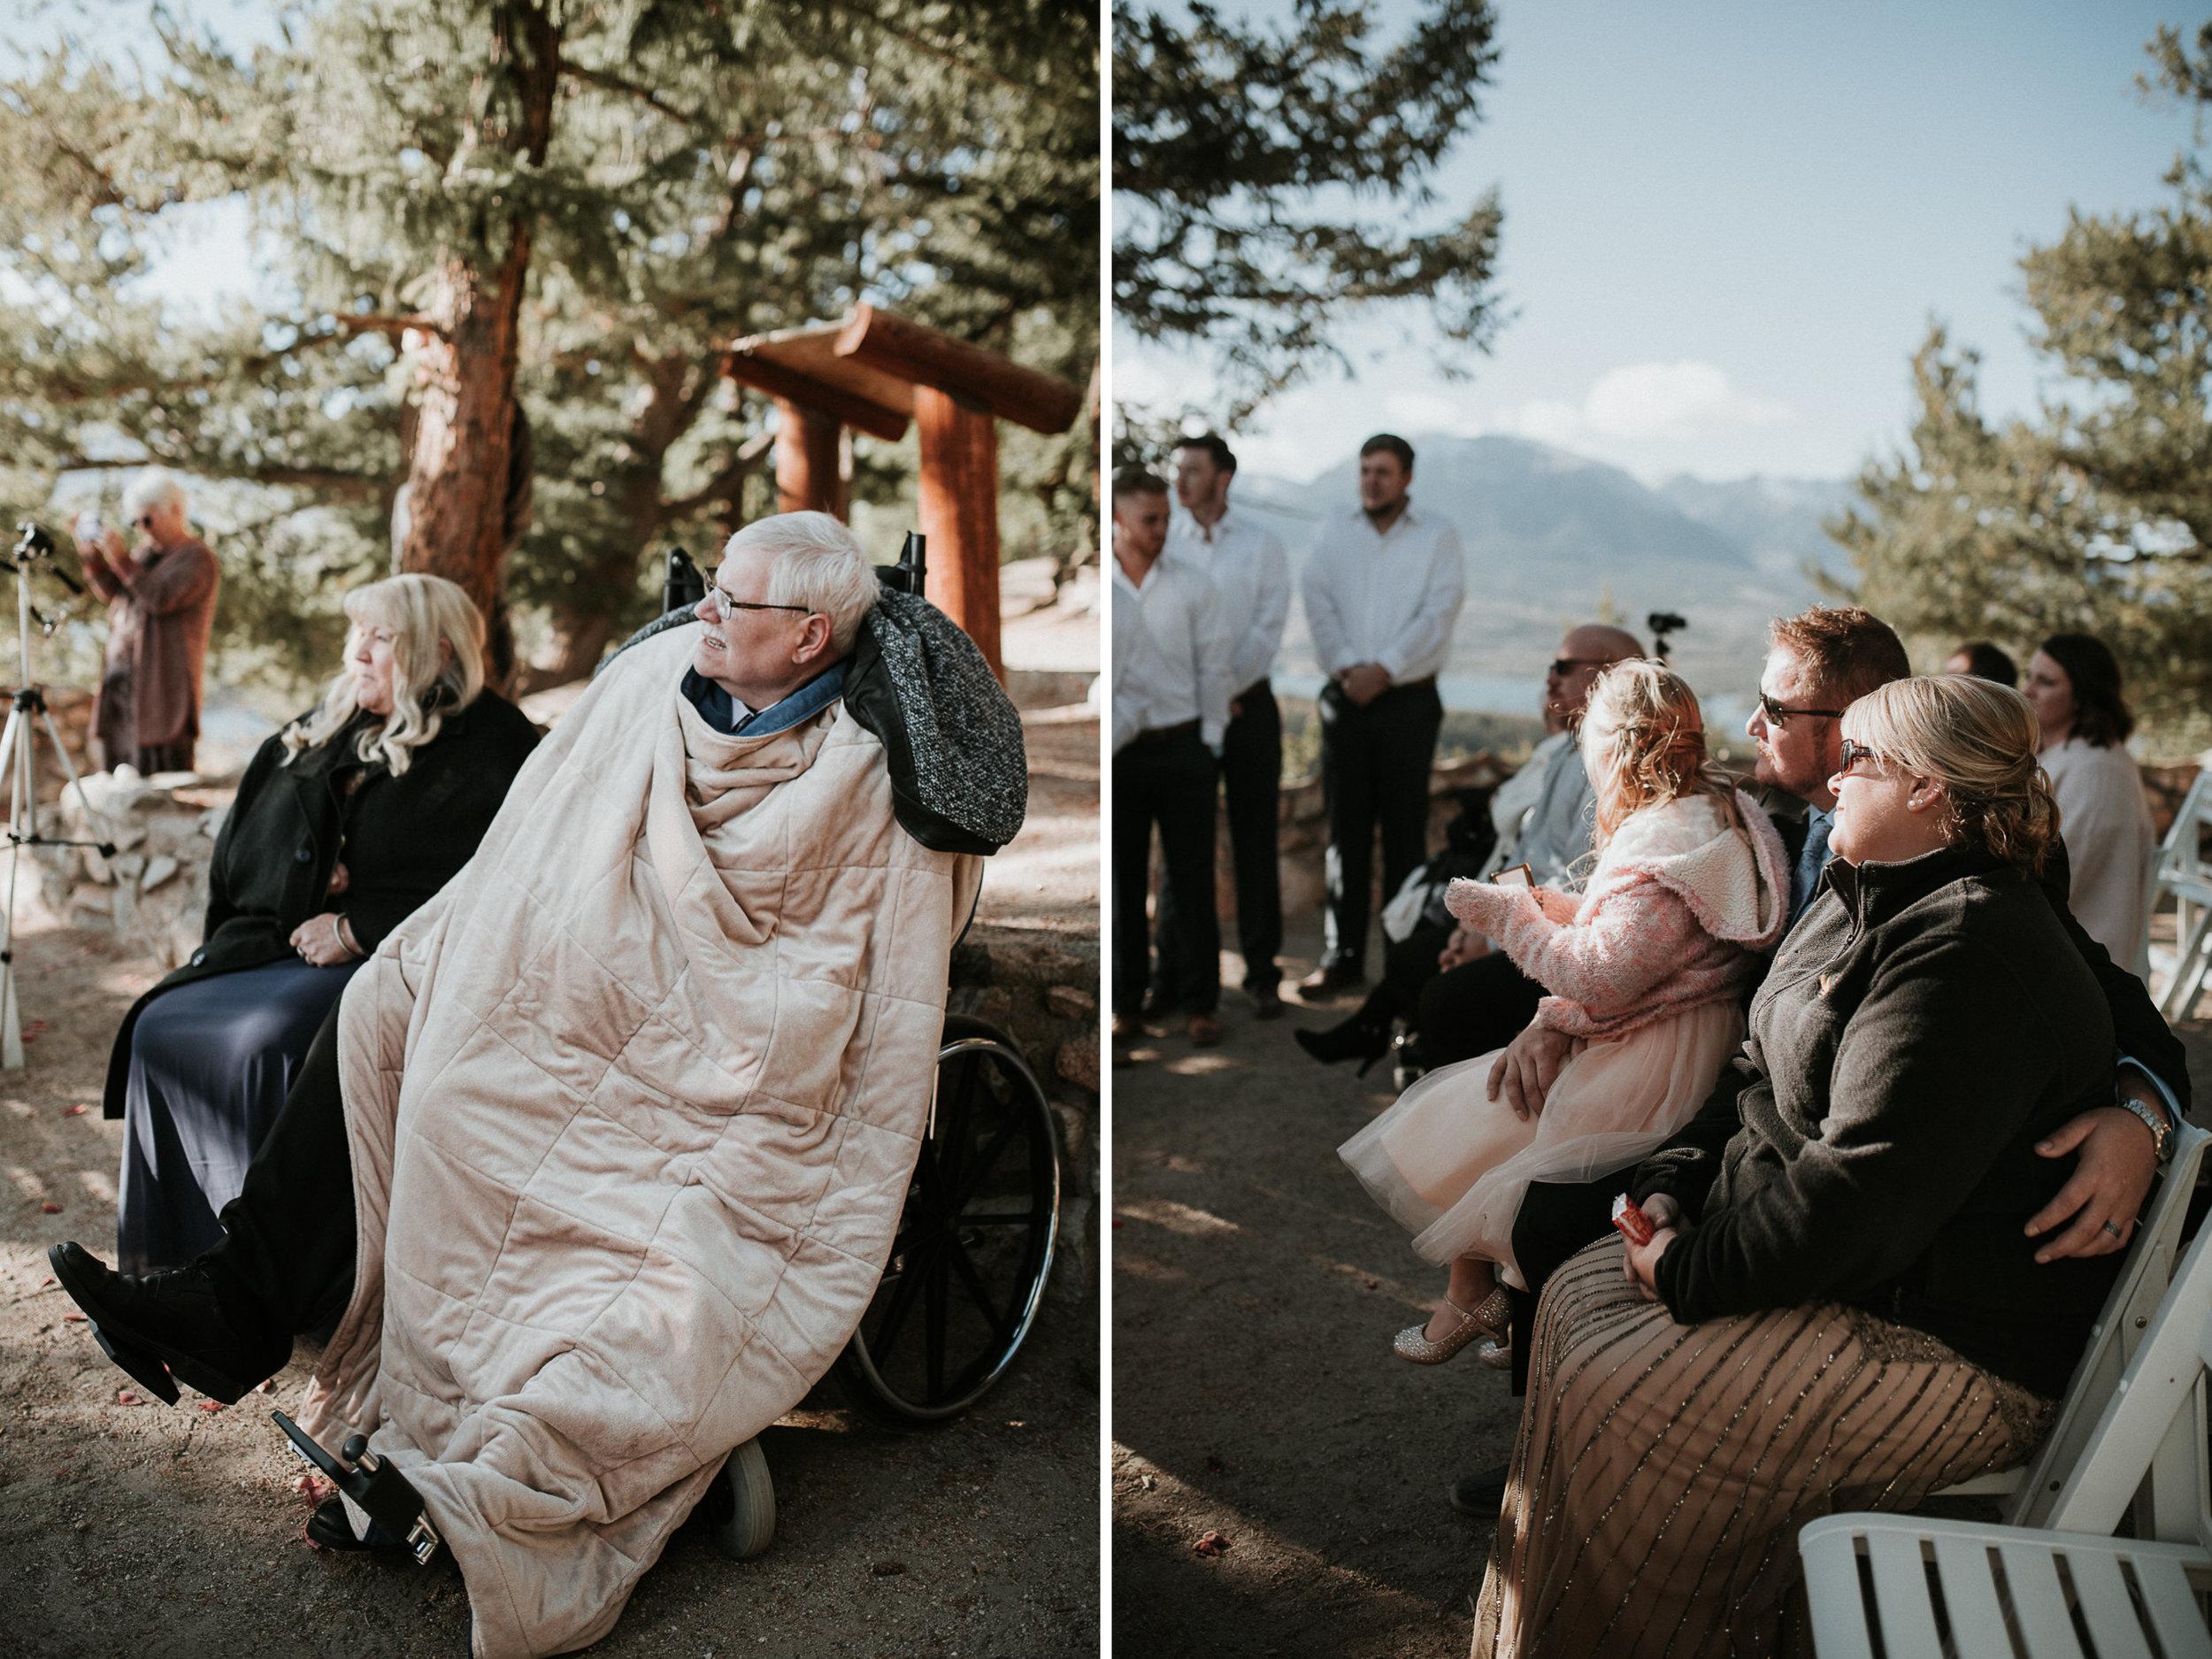 st. louis wedding photographer Zach&Rosalie - Lake Dillon CO Elopement 5.jpg